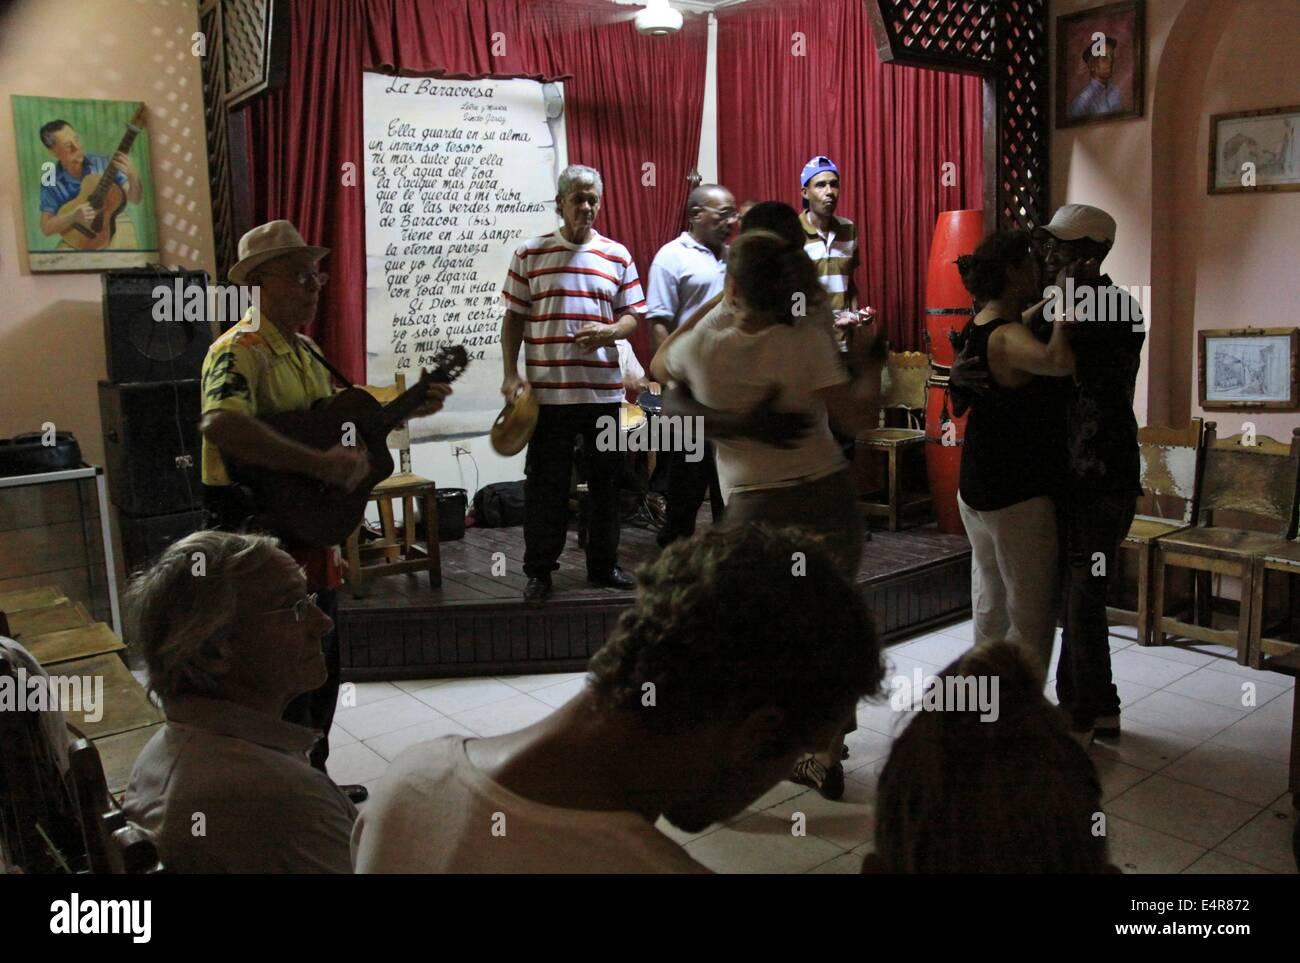 Nightlife in Baracoa, Cuba, 13 April 2014. The tiny bar 'Casa de la Trova' offers tourists life music by - Stock Image